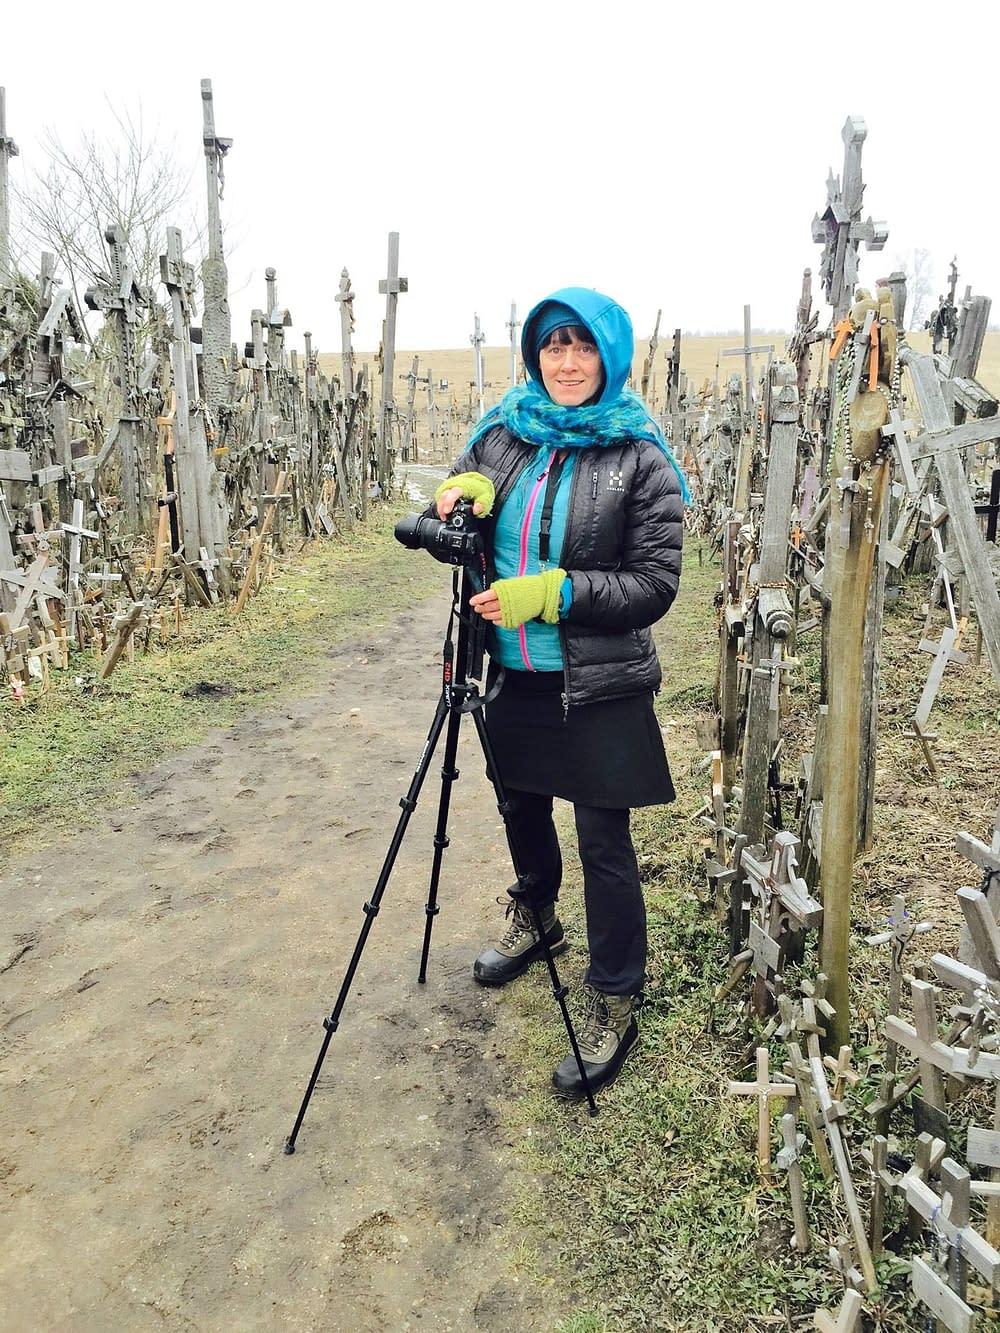 Storyteller Malin Skinnar at Kryziu Kalnas, Lithuania